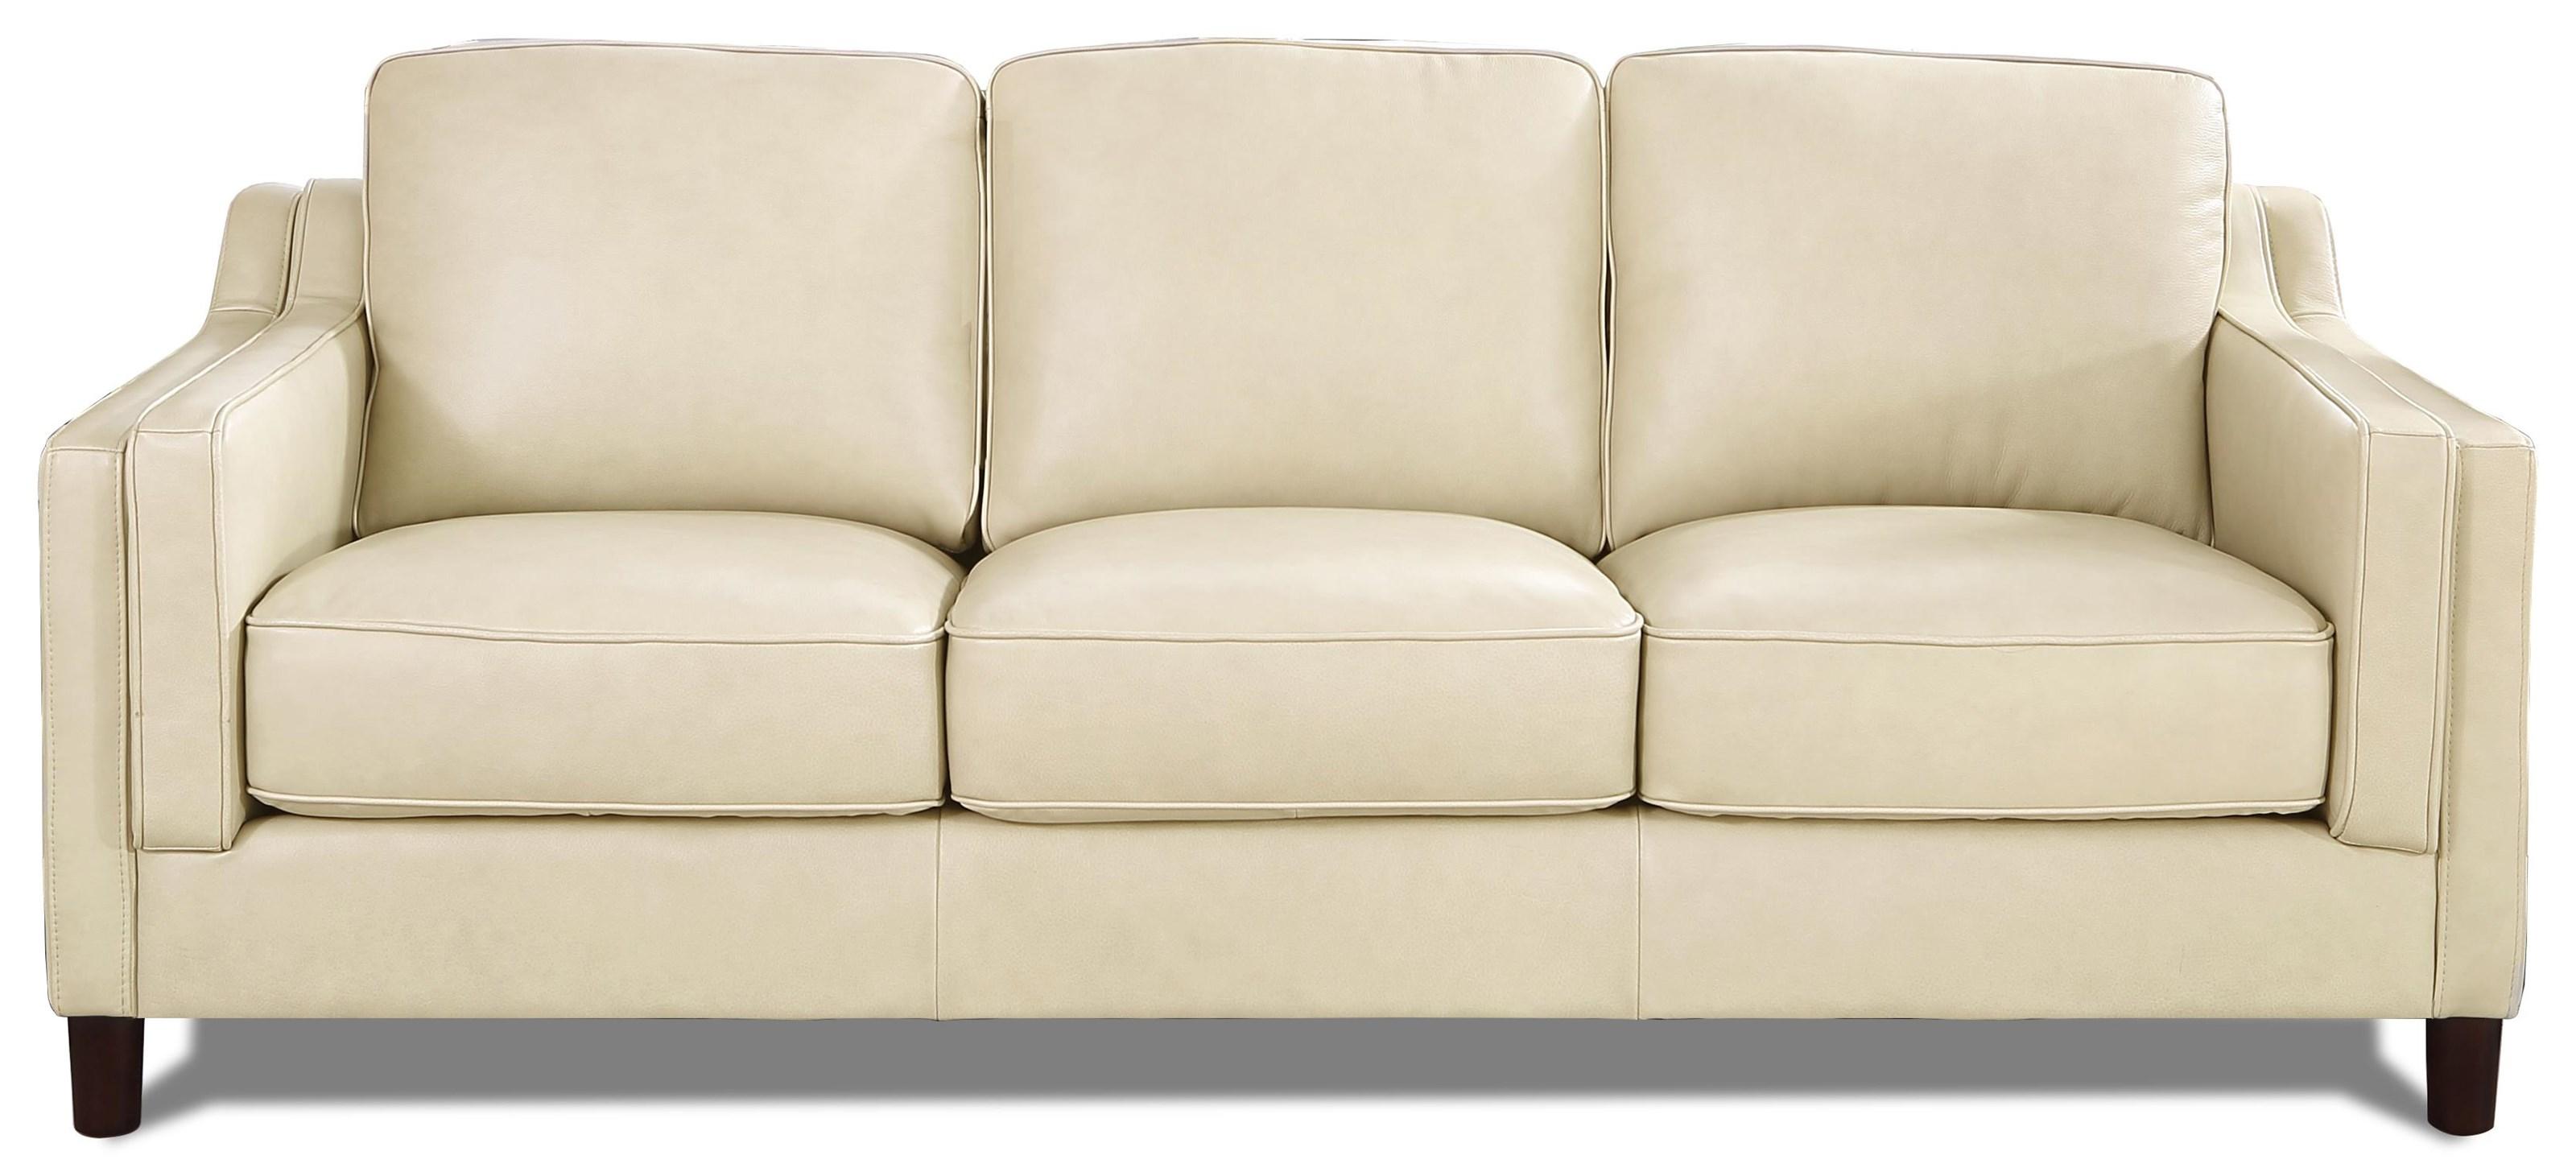 Camilla Dd Sofa by Amax at Stoney Creek Furniture